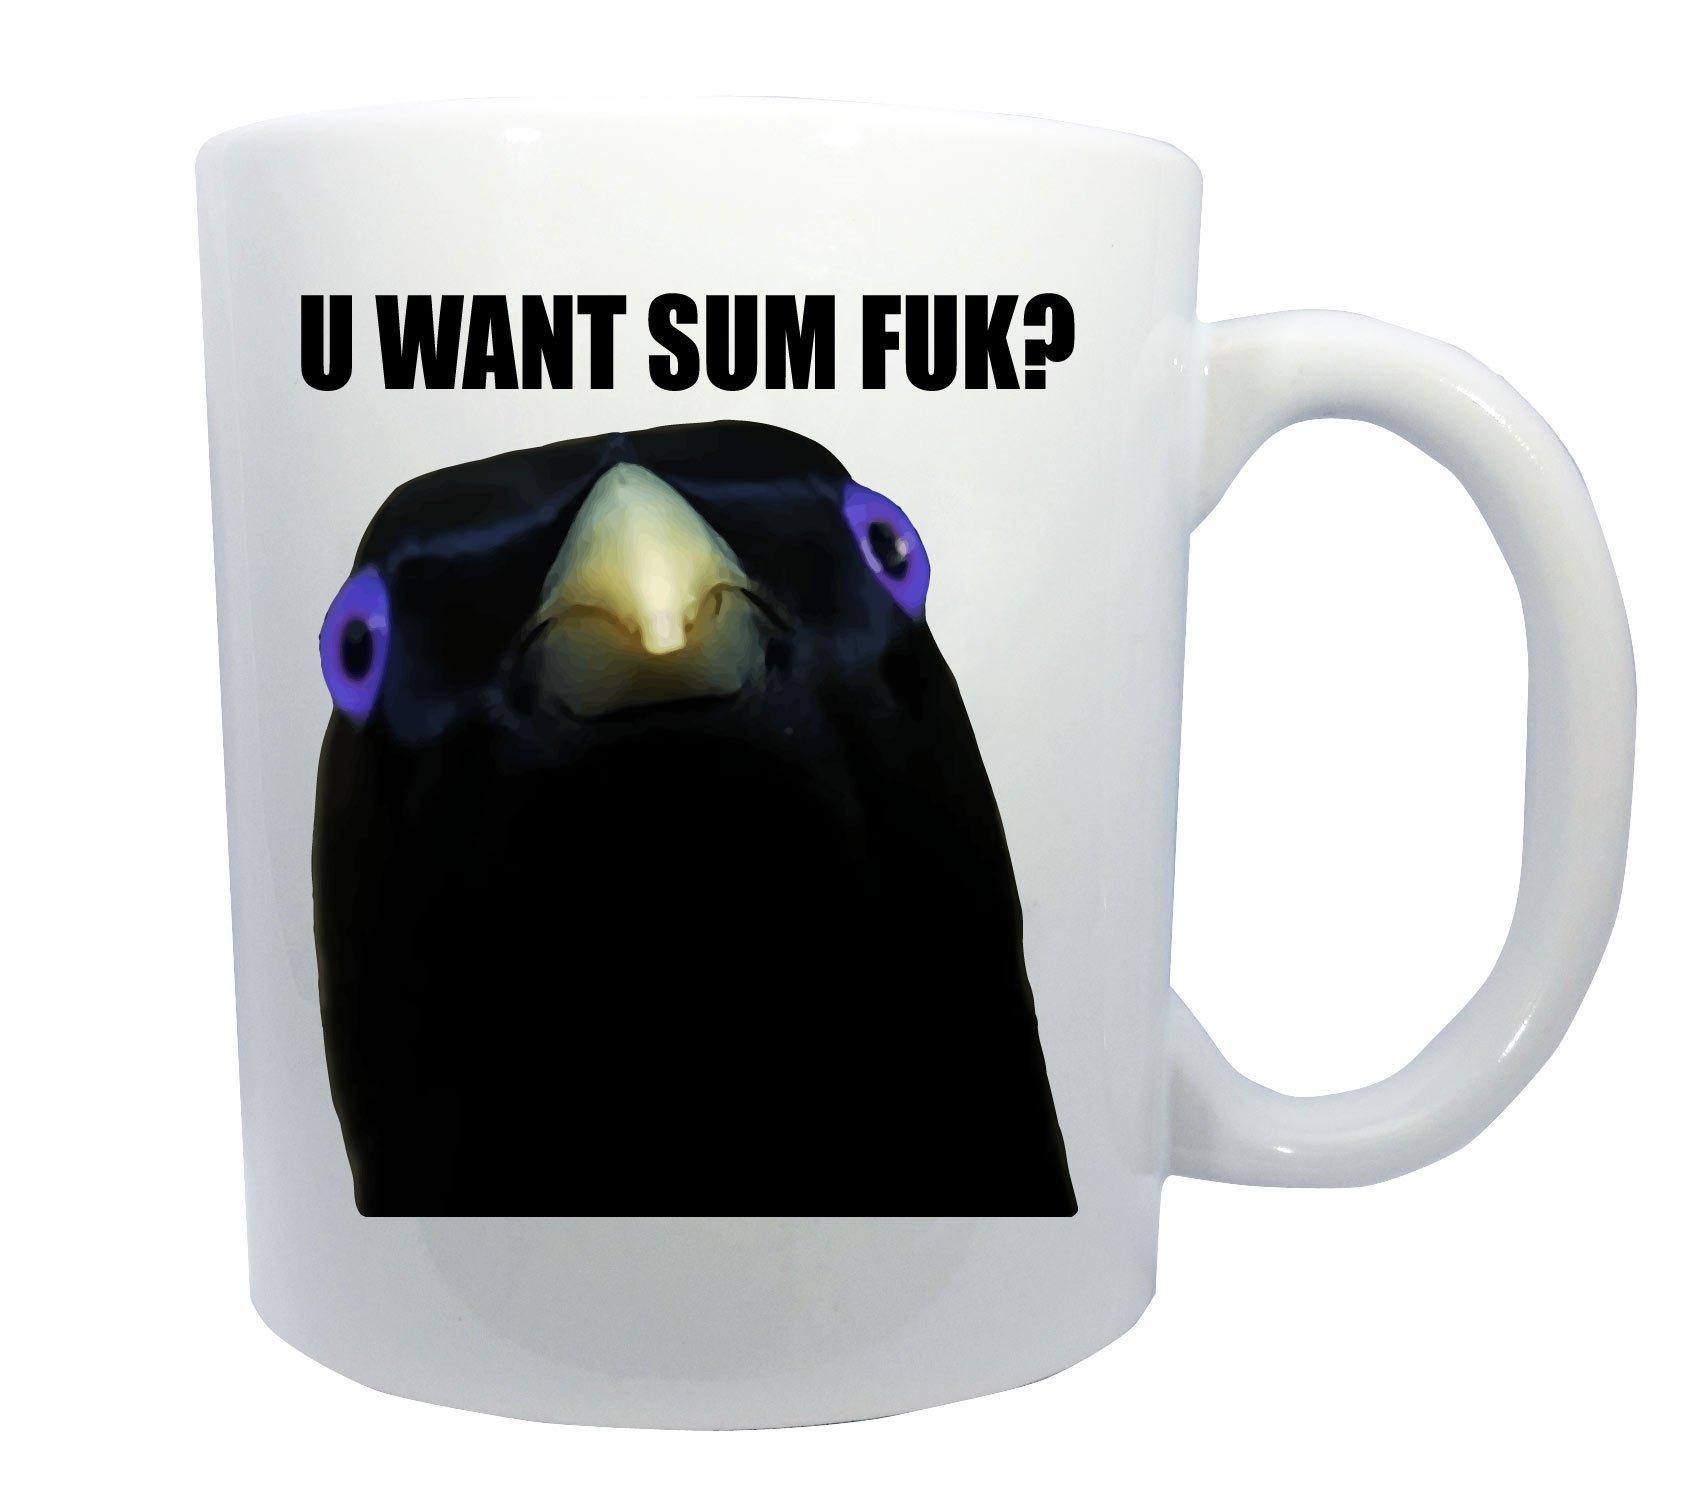 U Want Sum Fuk? Lemme Smash Bird Internet Meme Coffee or Tea 11oz Mug - Perfect Gift